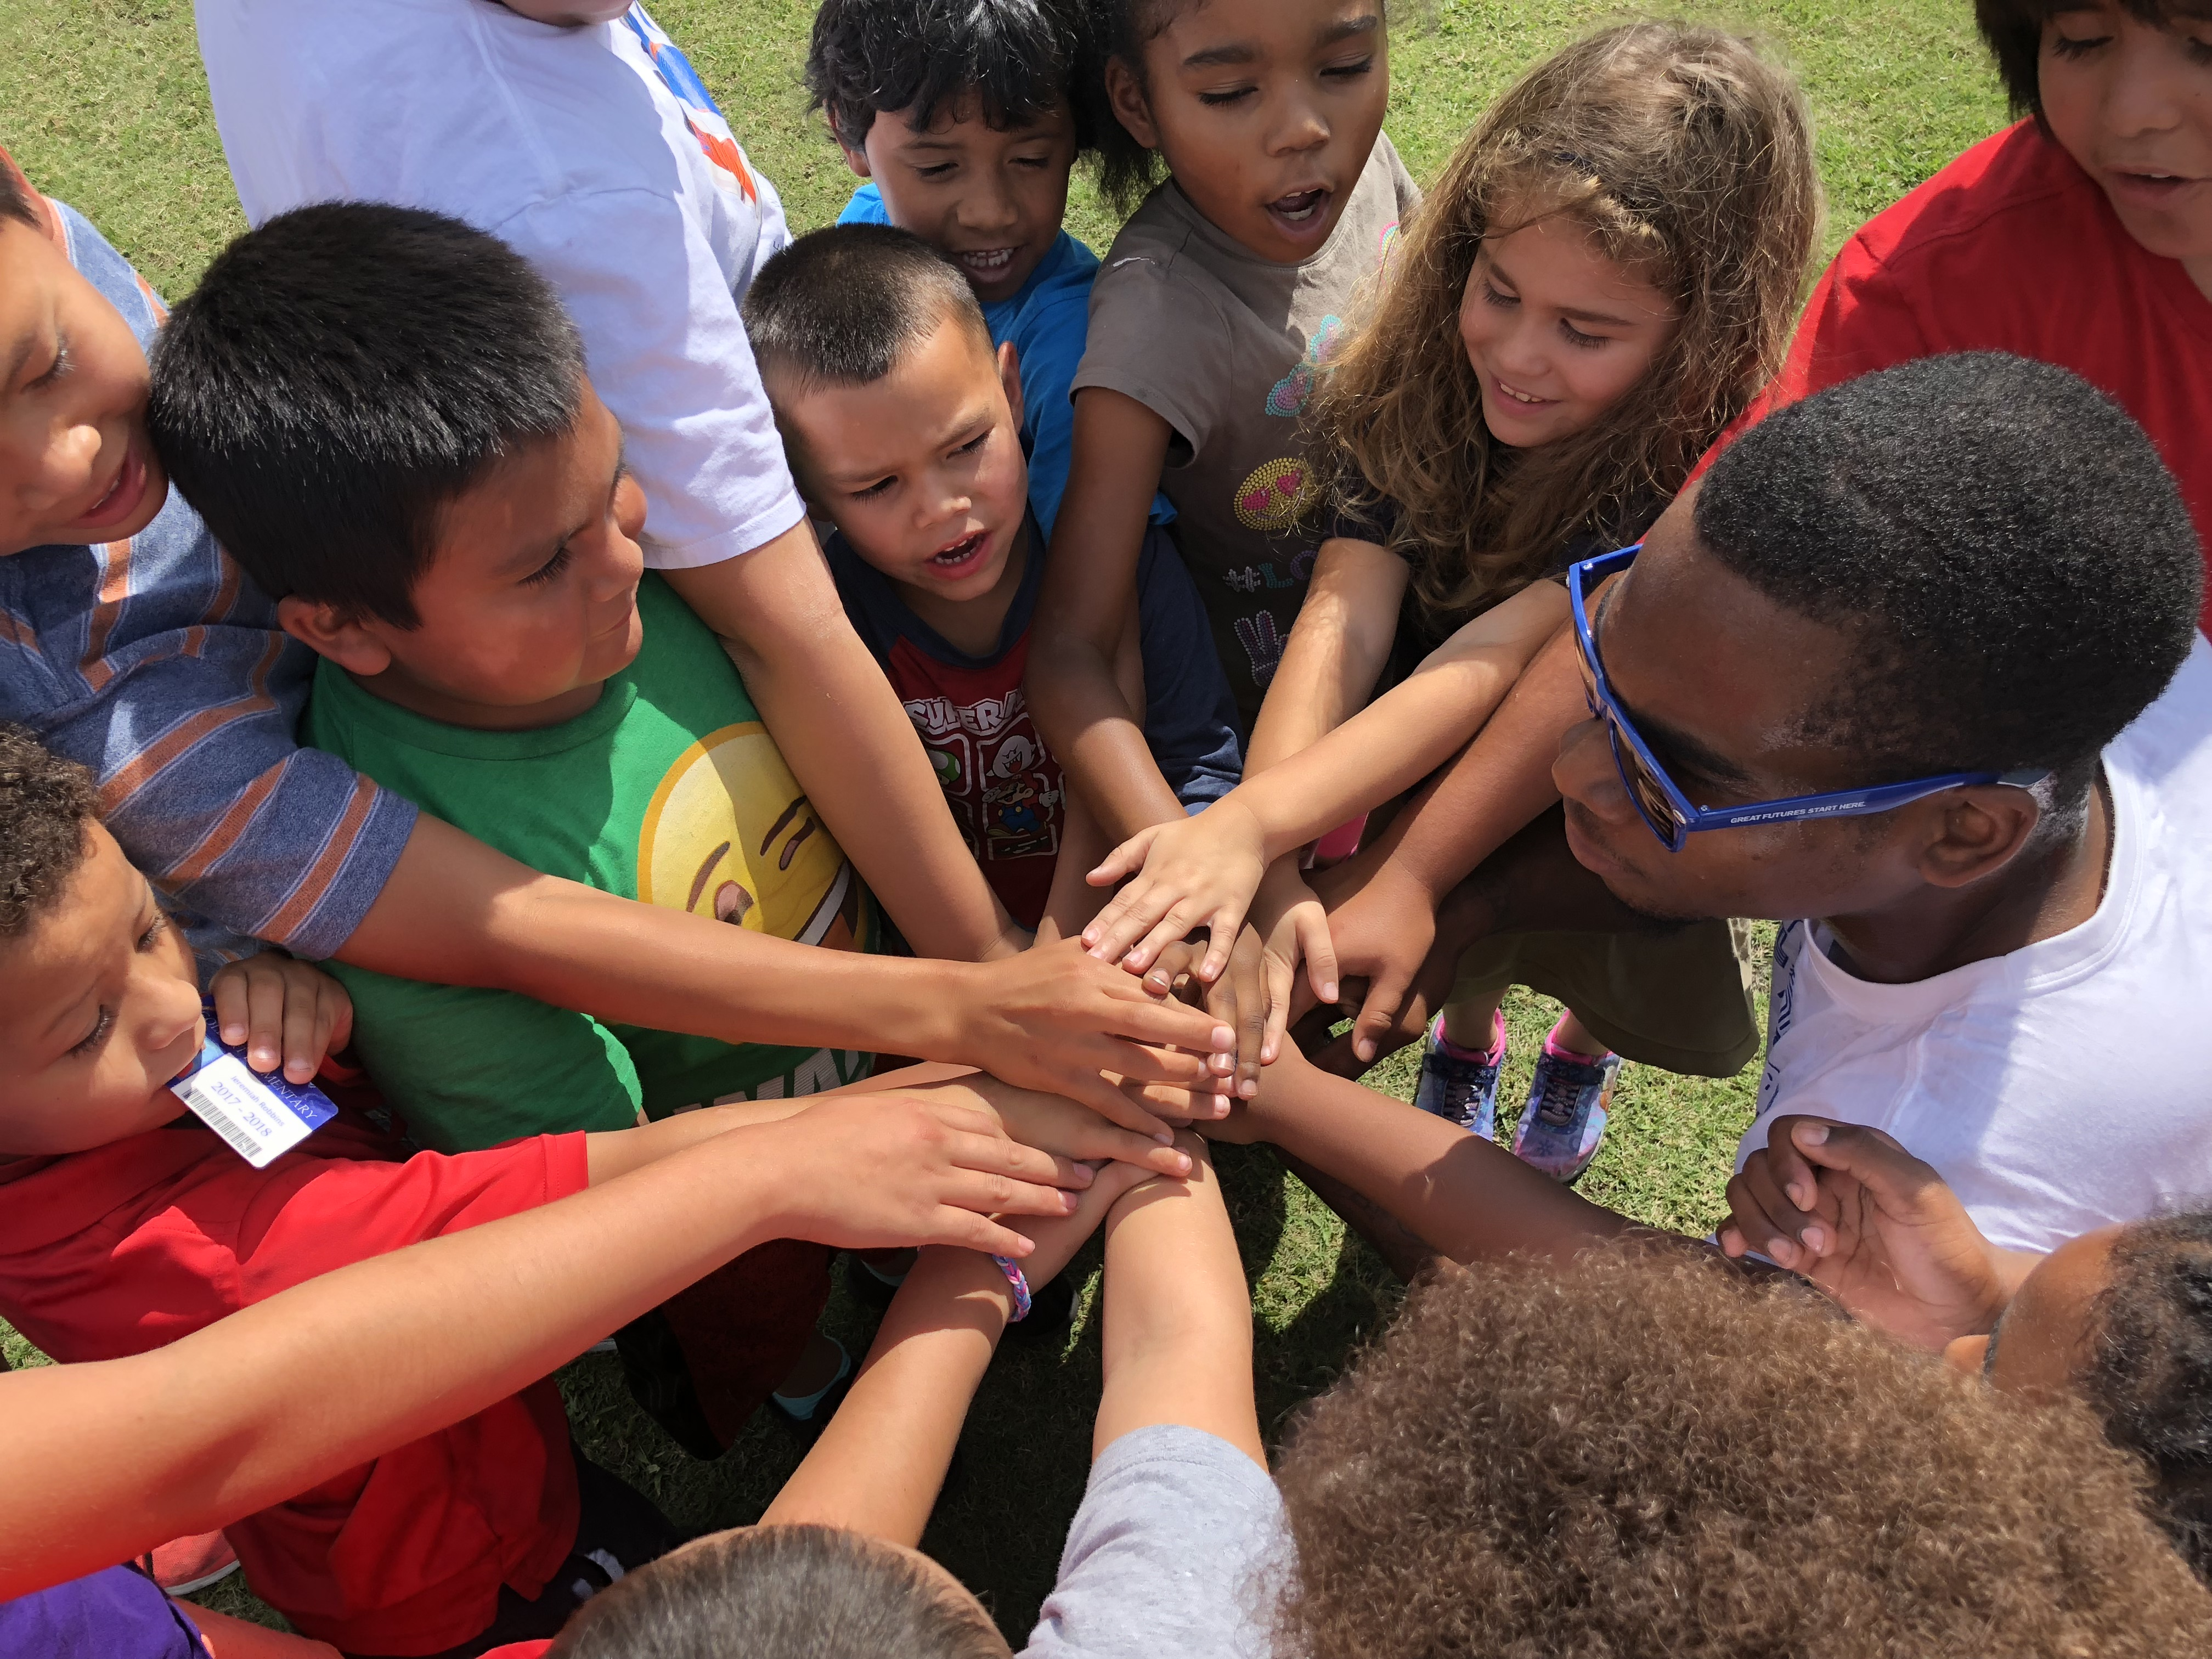 How Rich Kids Get Head Start >> Hollywood Kids Get Head Start With Nike Running The Seminole Tribune